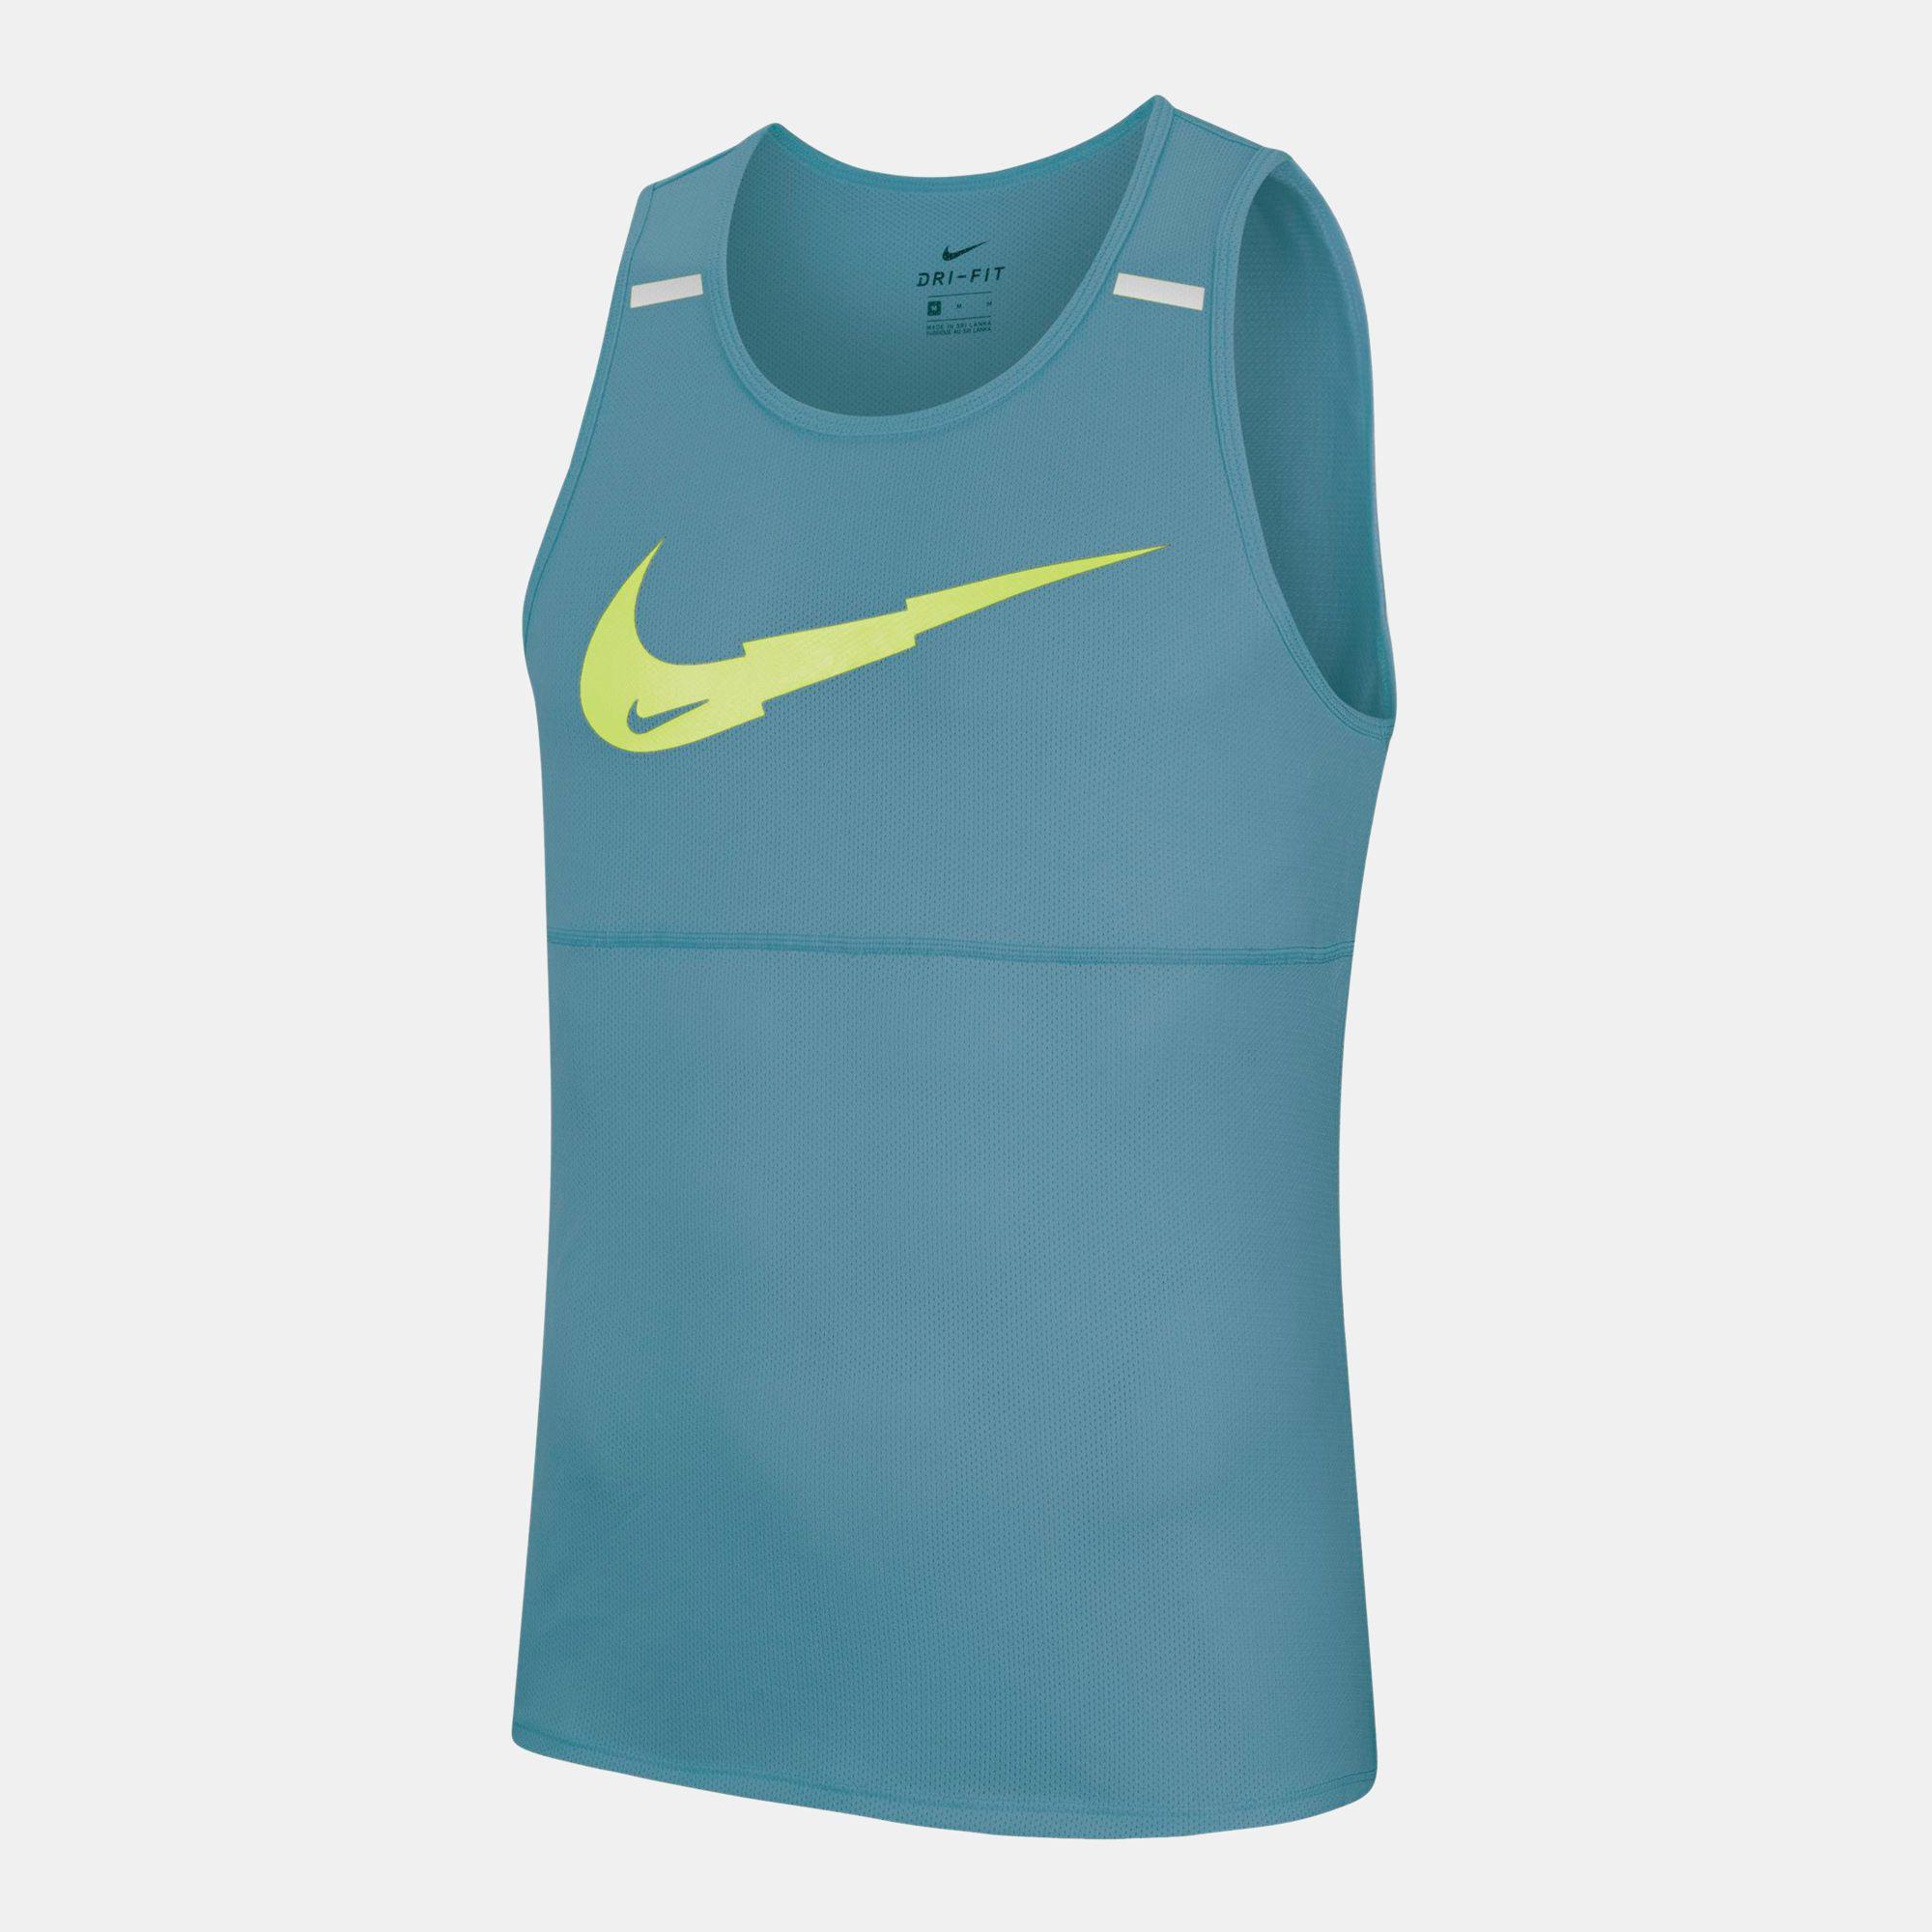 Nike Men's Breathe WR Running Tank Top